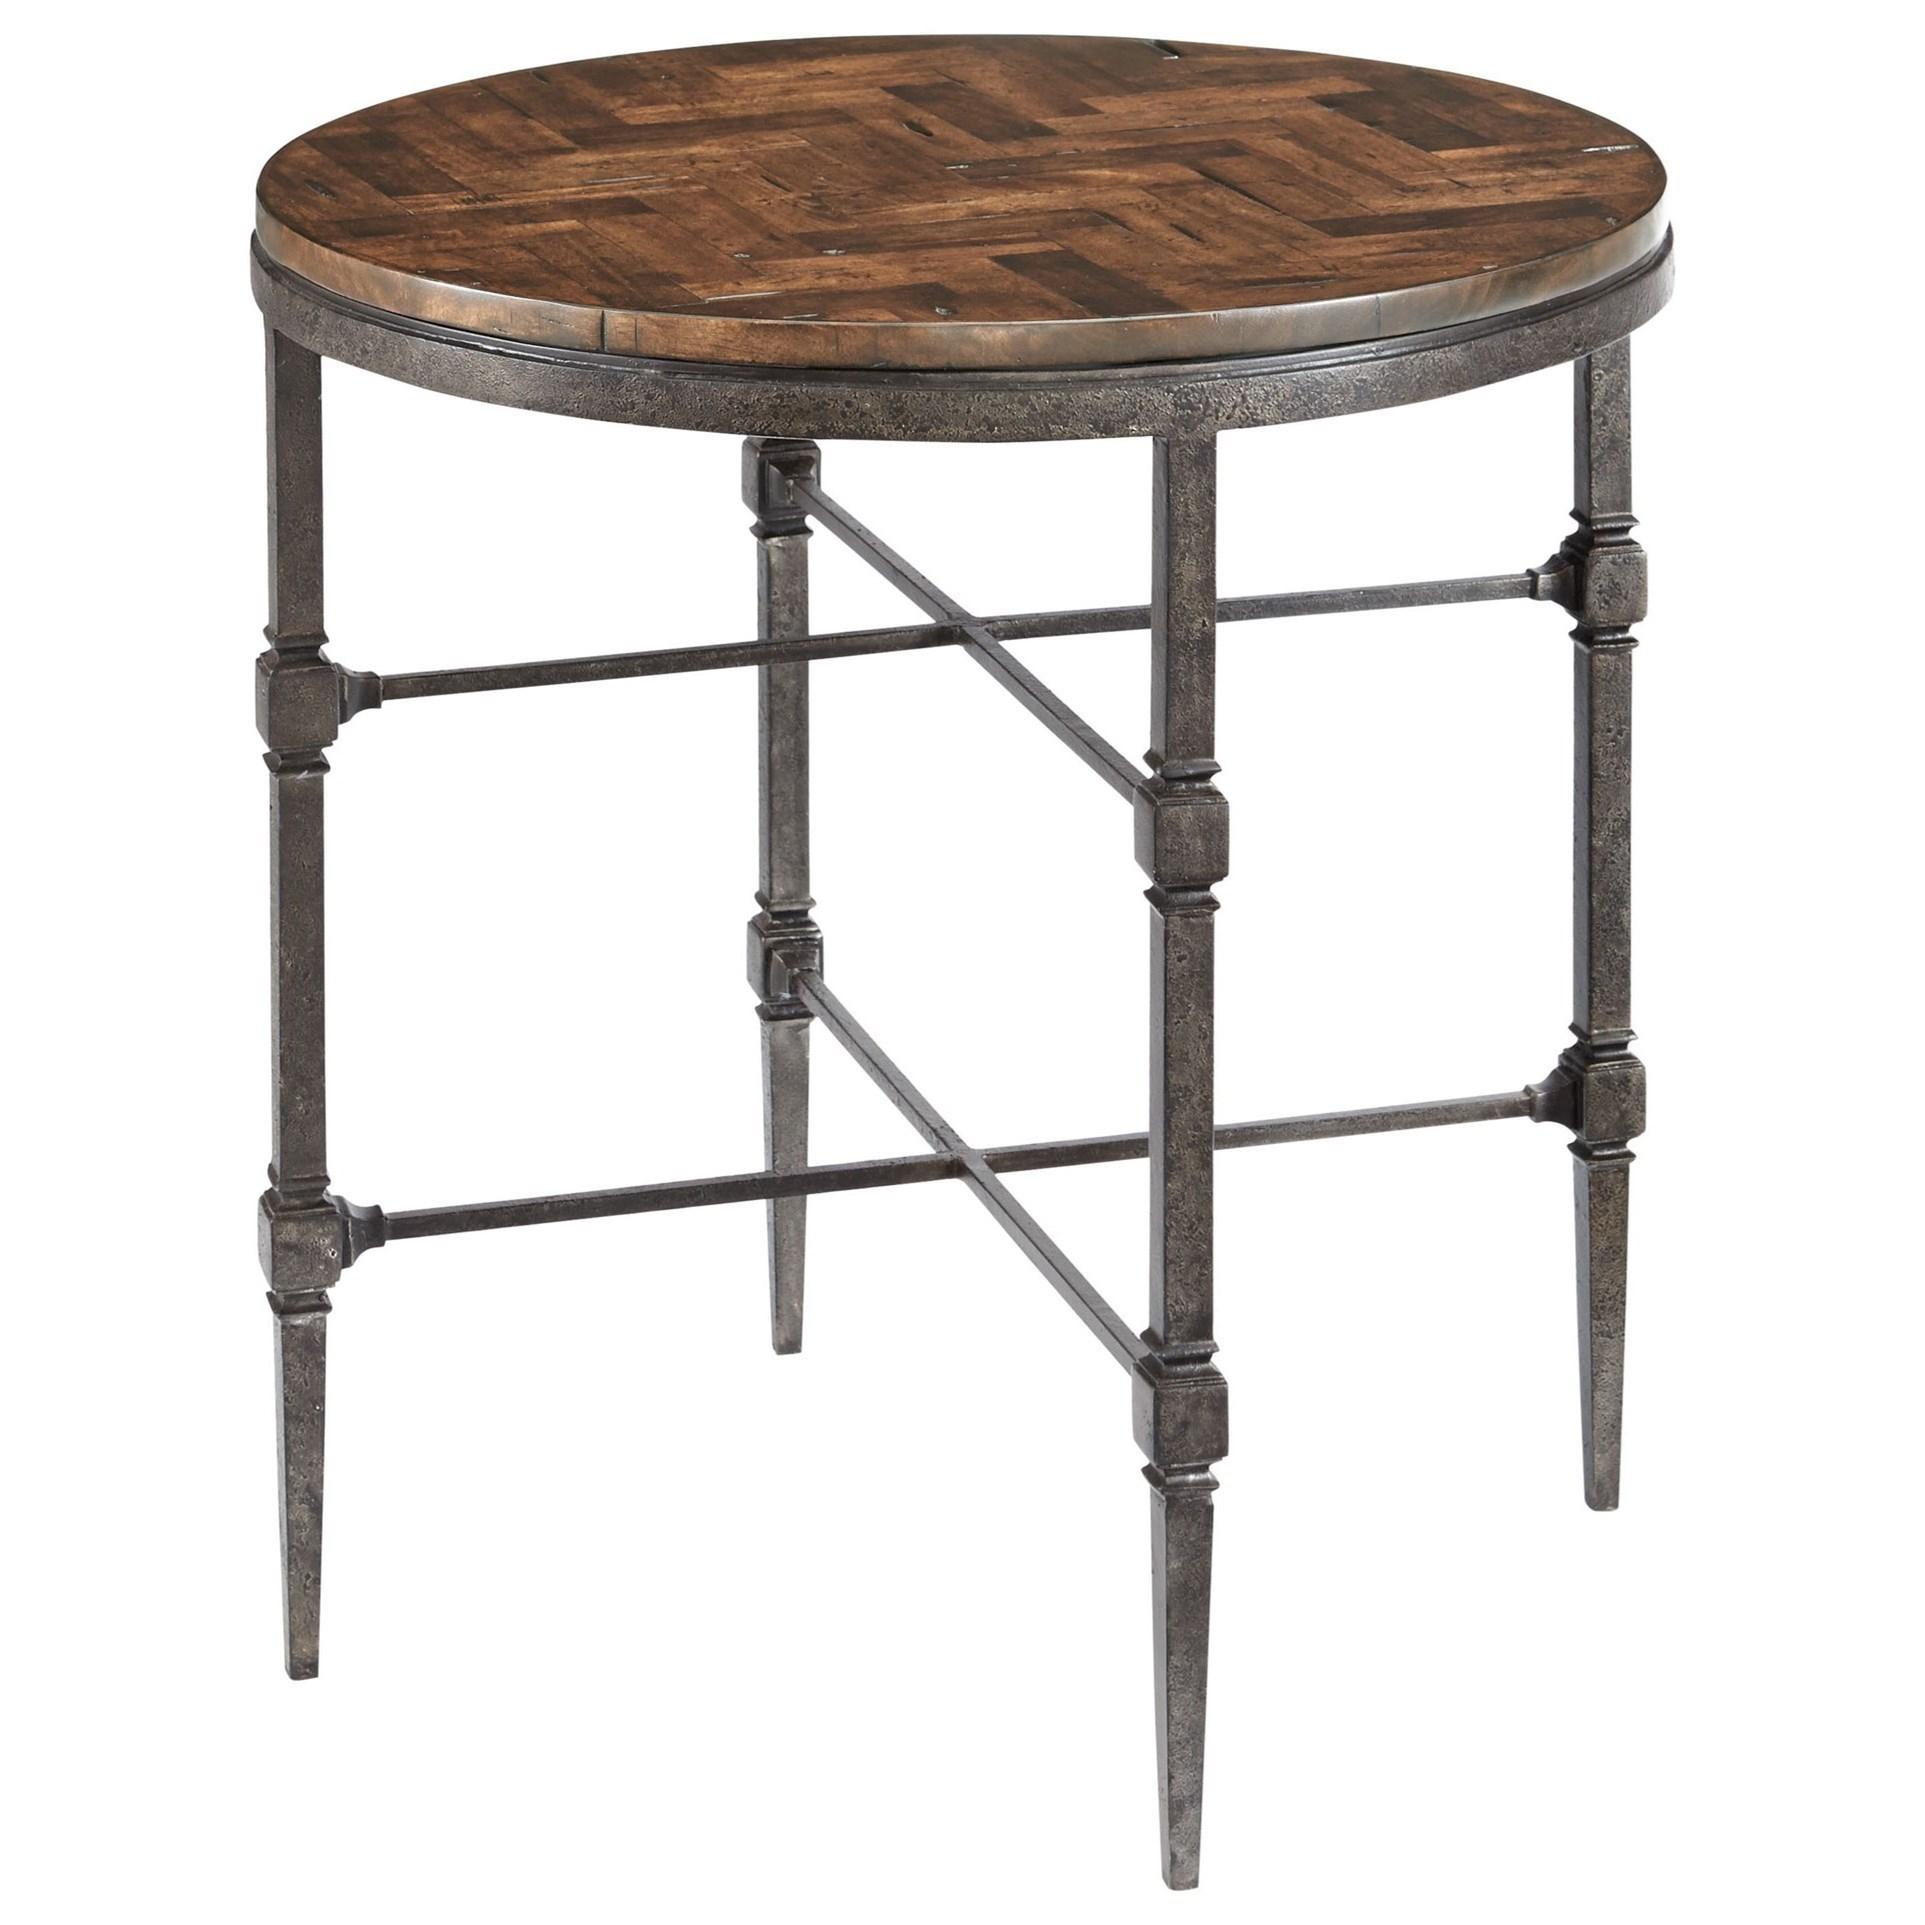 Everett Round Herringbone End Table by Bernhardt at Fisher Home Furnishings